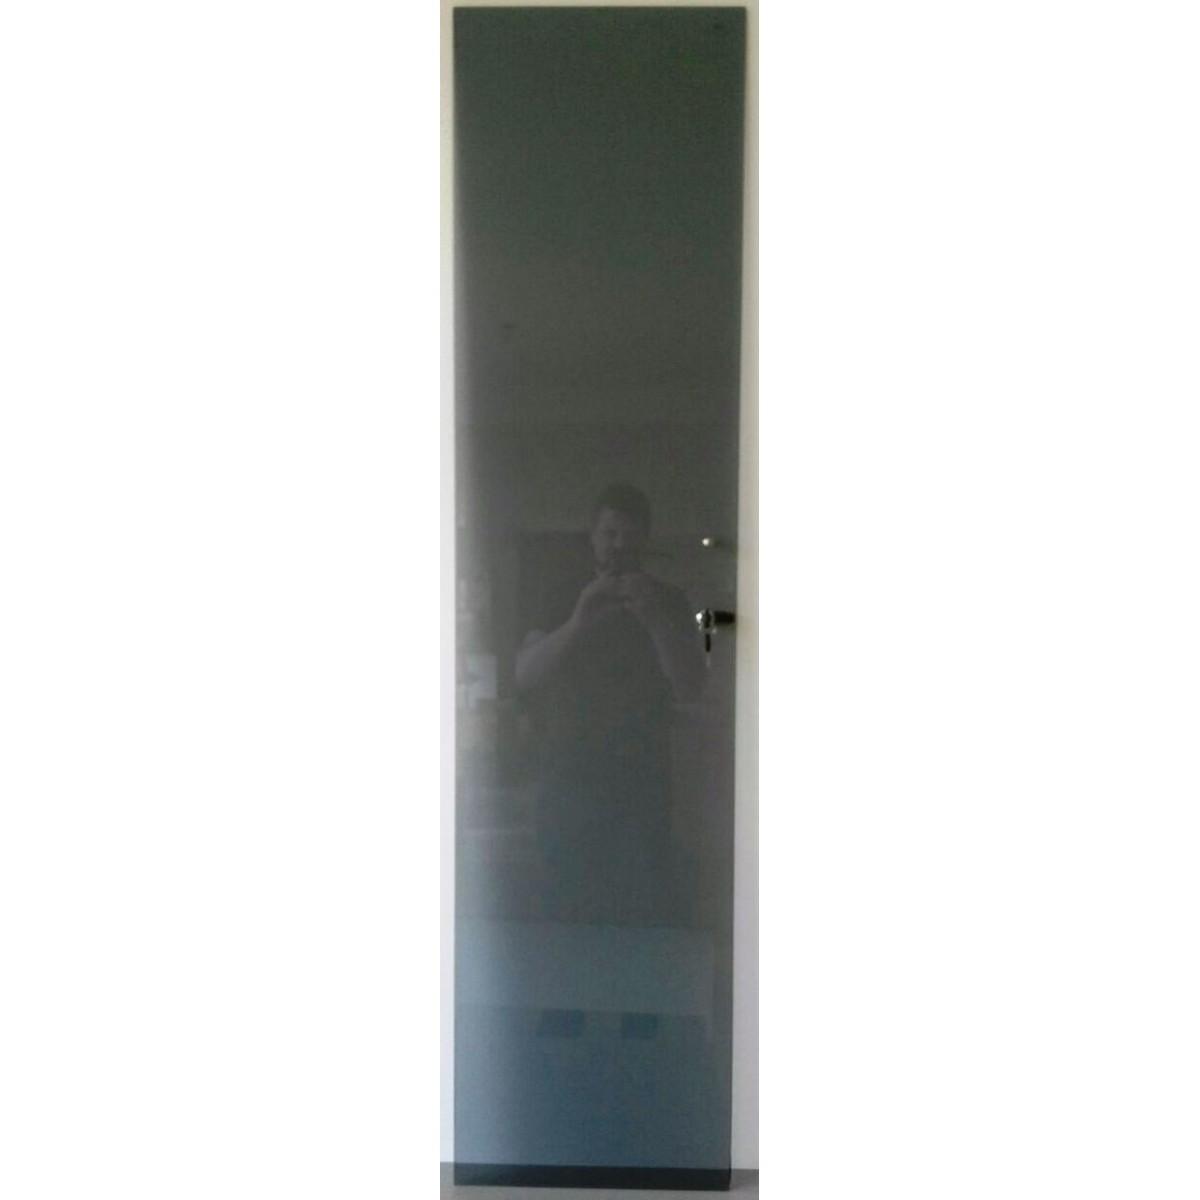 Porta Vidro Fumê com Chave para Estante CD/DVD/Blu-ray